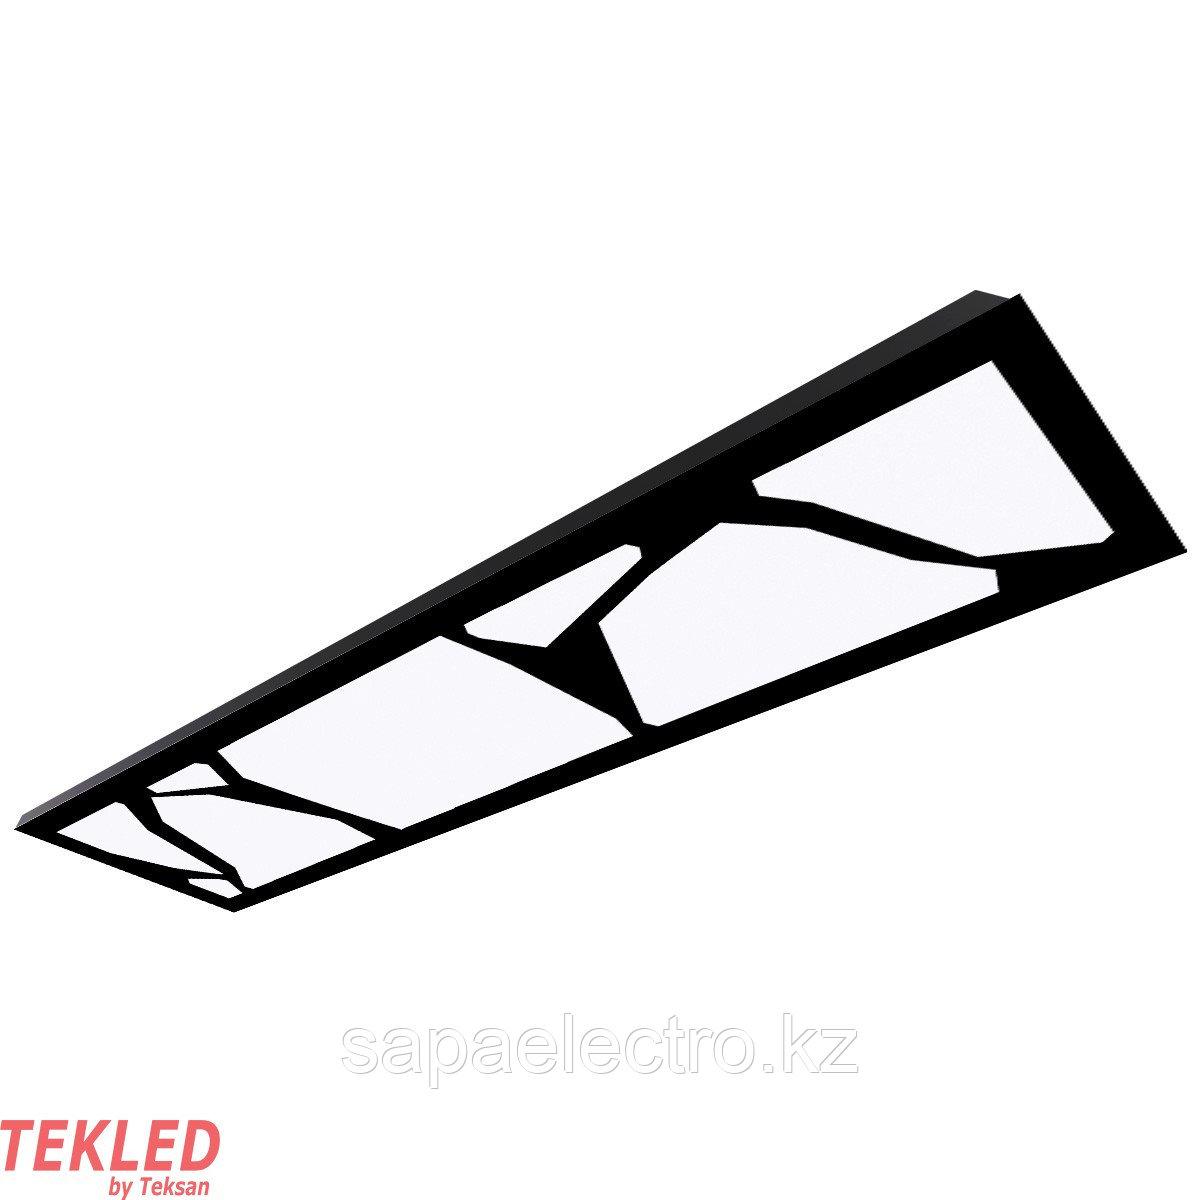 Св-к  OPALLED MARBLE 48W BLACK S/A  1200x300 4500K